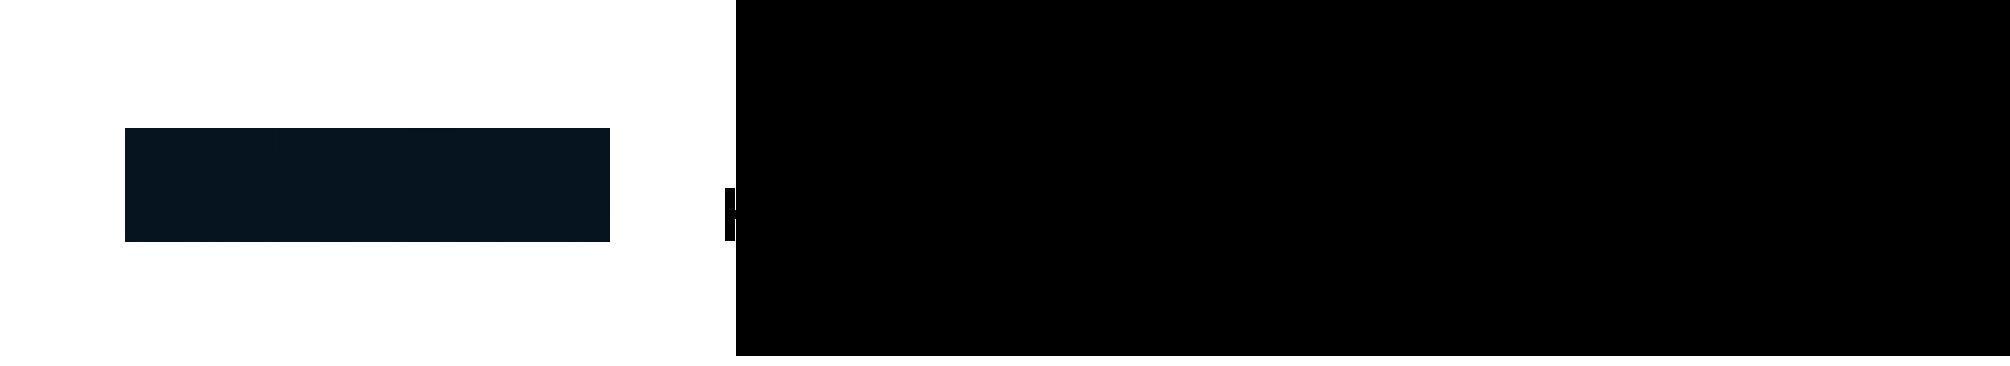 Kia Store Rainbow City - Gadsden logo